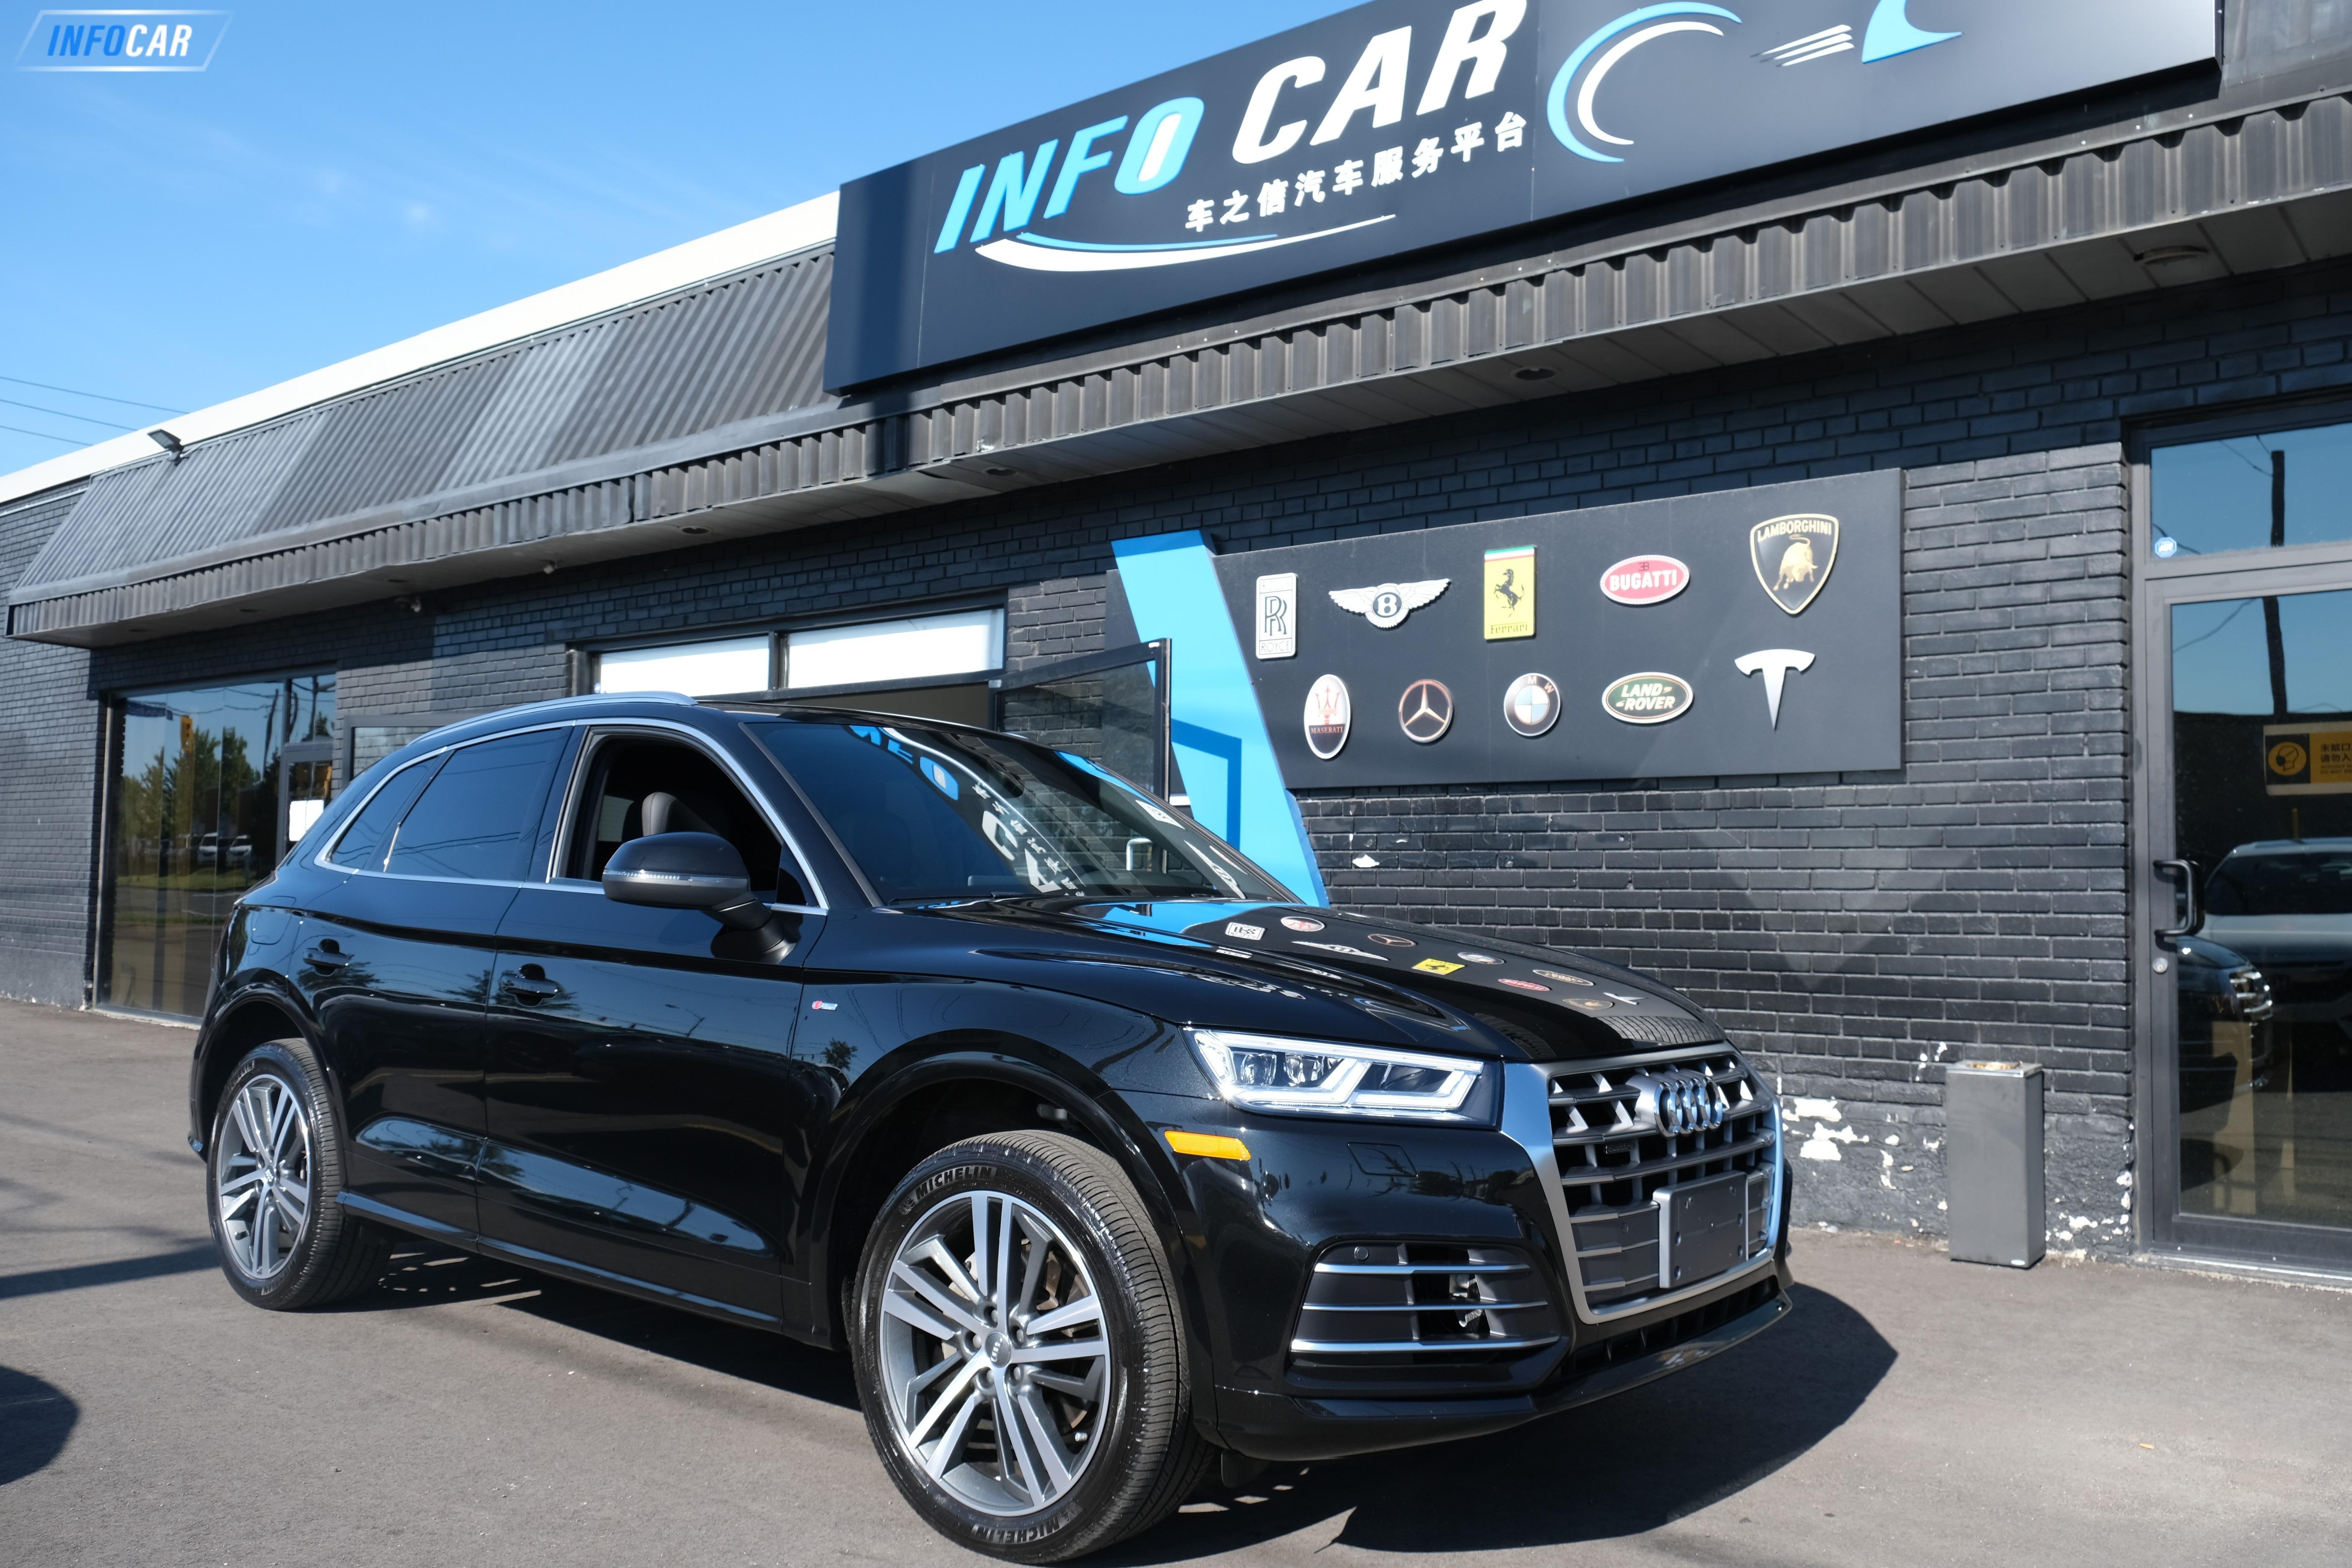 2019 Audi Q5 progressiv quattro - INFOCAR - Toronto's Most Comprehensive New and Used Auto Trading Platform